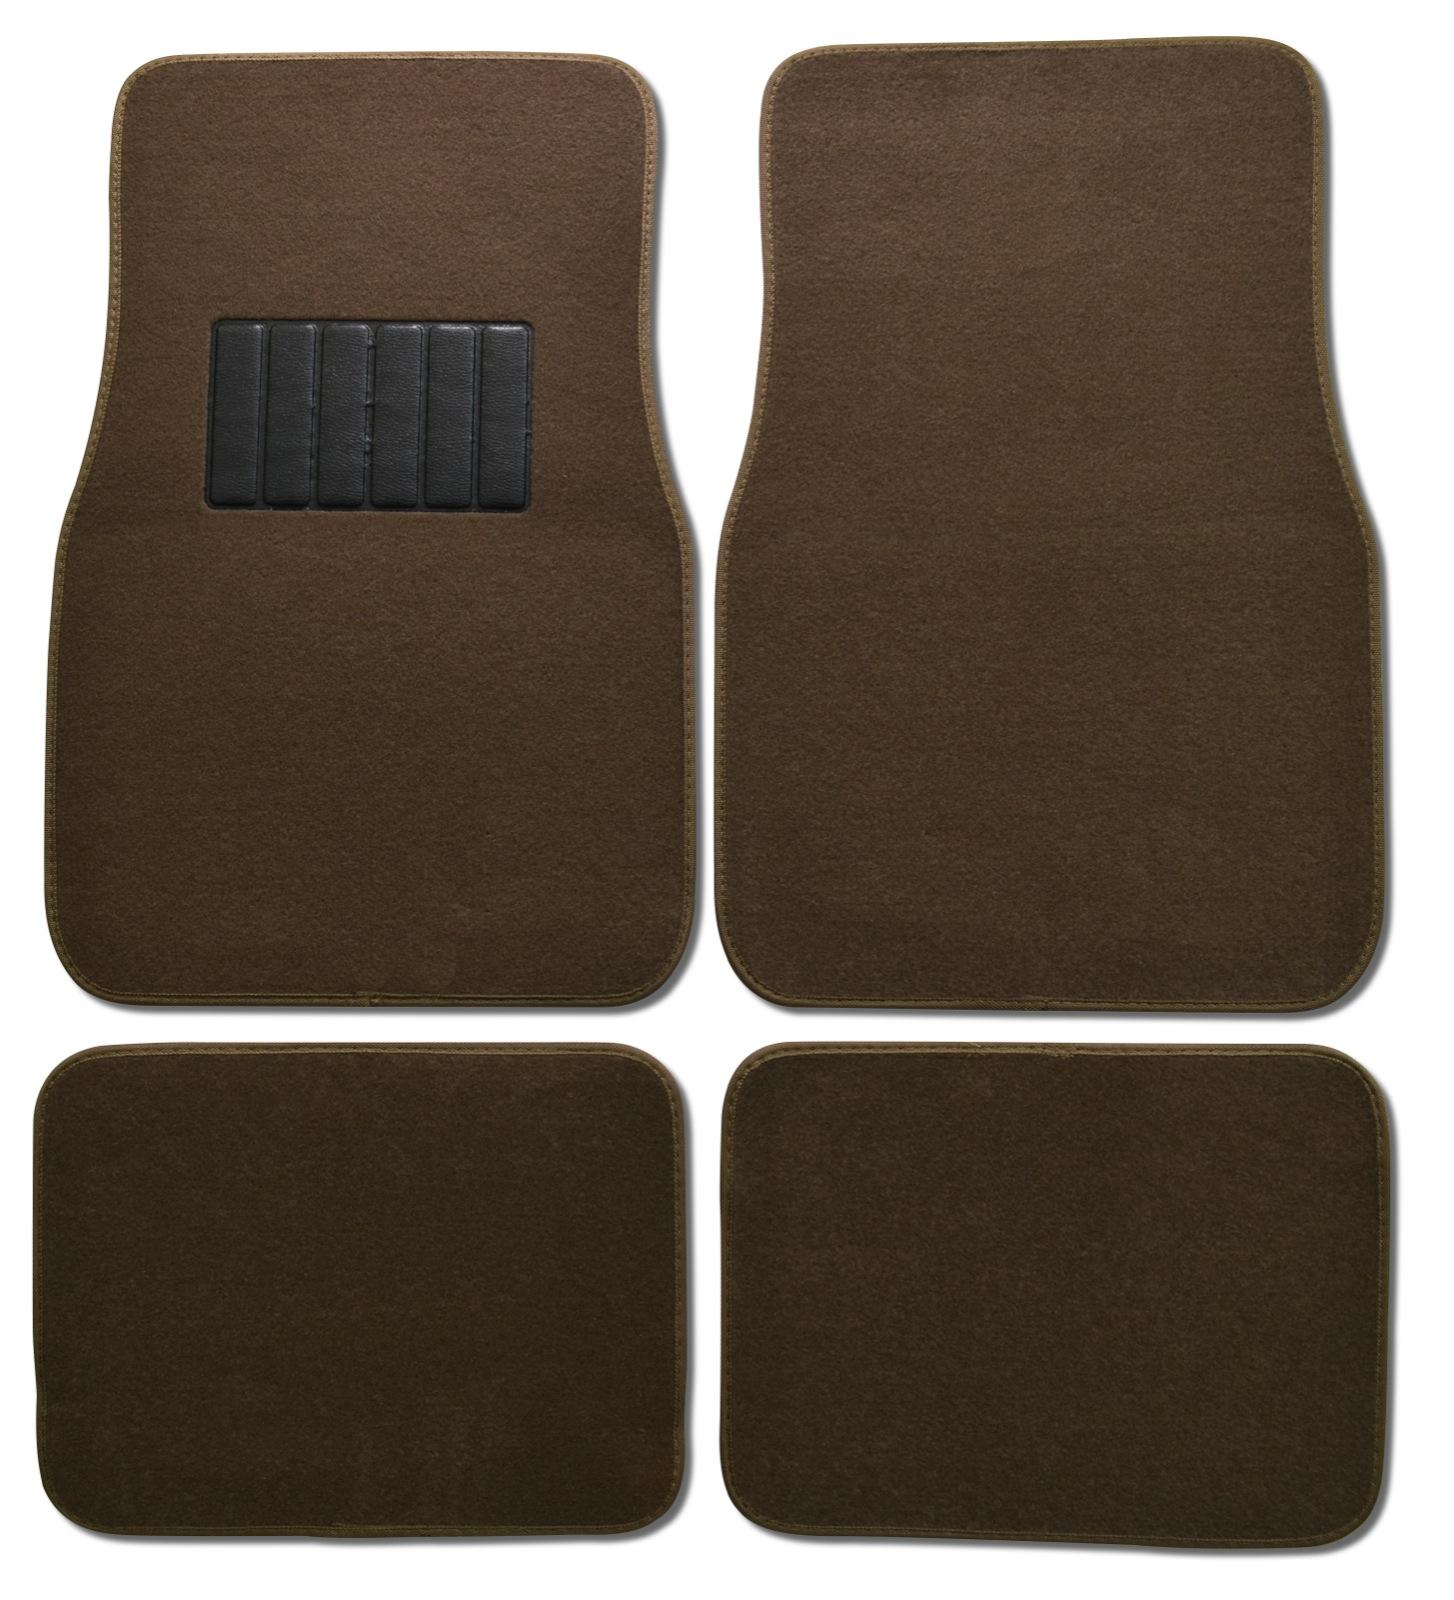 BDK Car Floor Mats 4 Pieces Carpet Protection - Universal Fit for Car, SUV, VA & Truck, Front & Rear